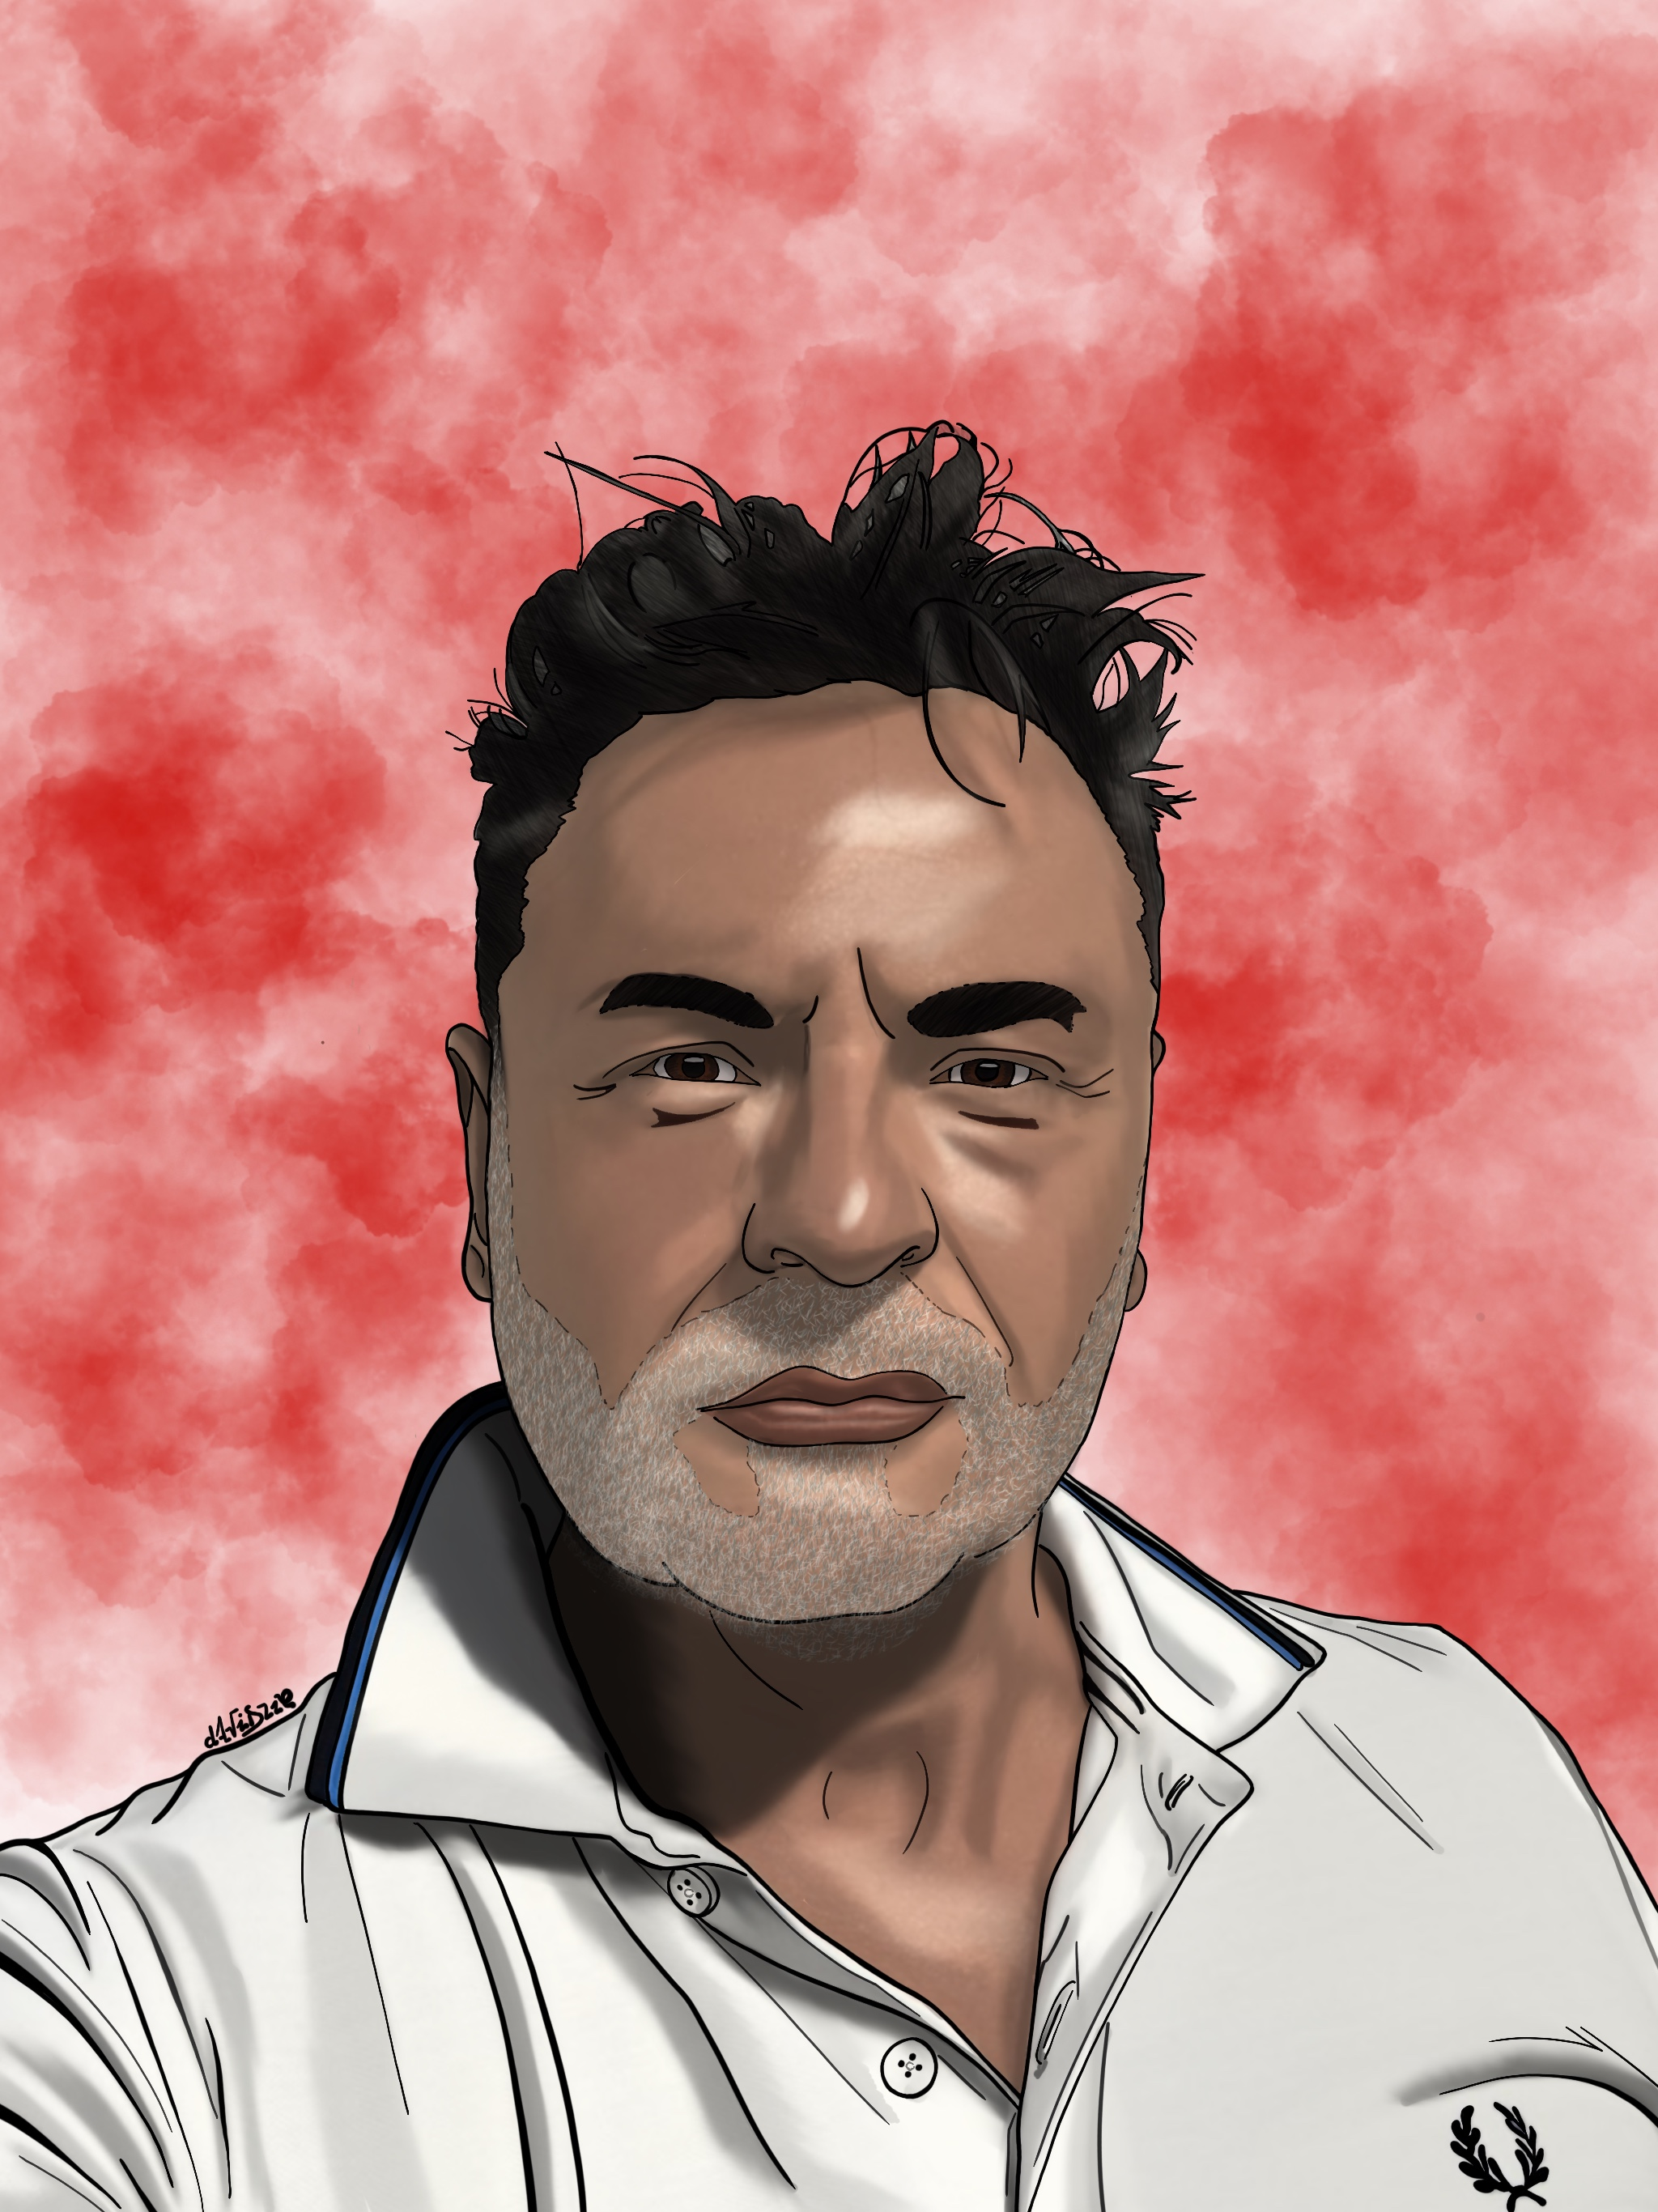 Retratos__David_Pallás_Gozalo_Nubes_roja